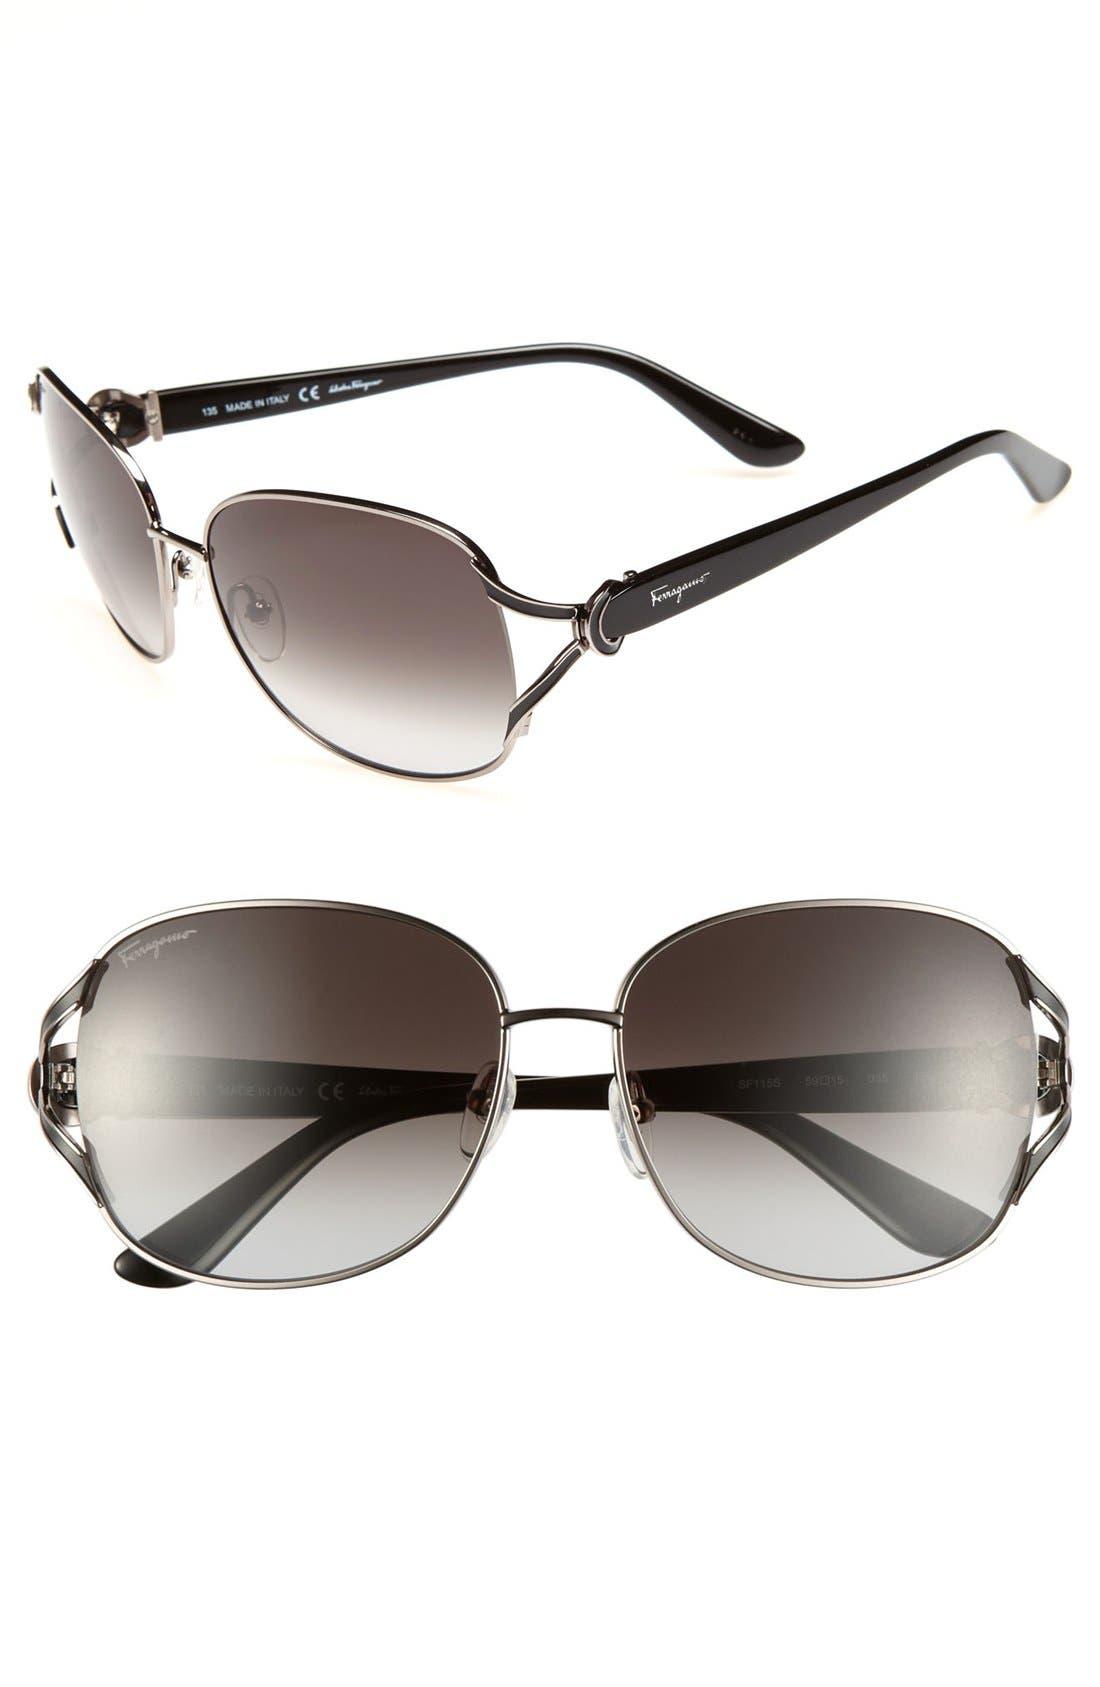 Alternate Image 1 Selected - Salvatore Ferragamo 59mm Metal Sunglasses